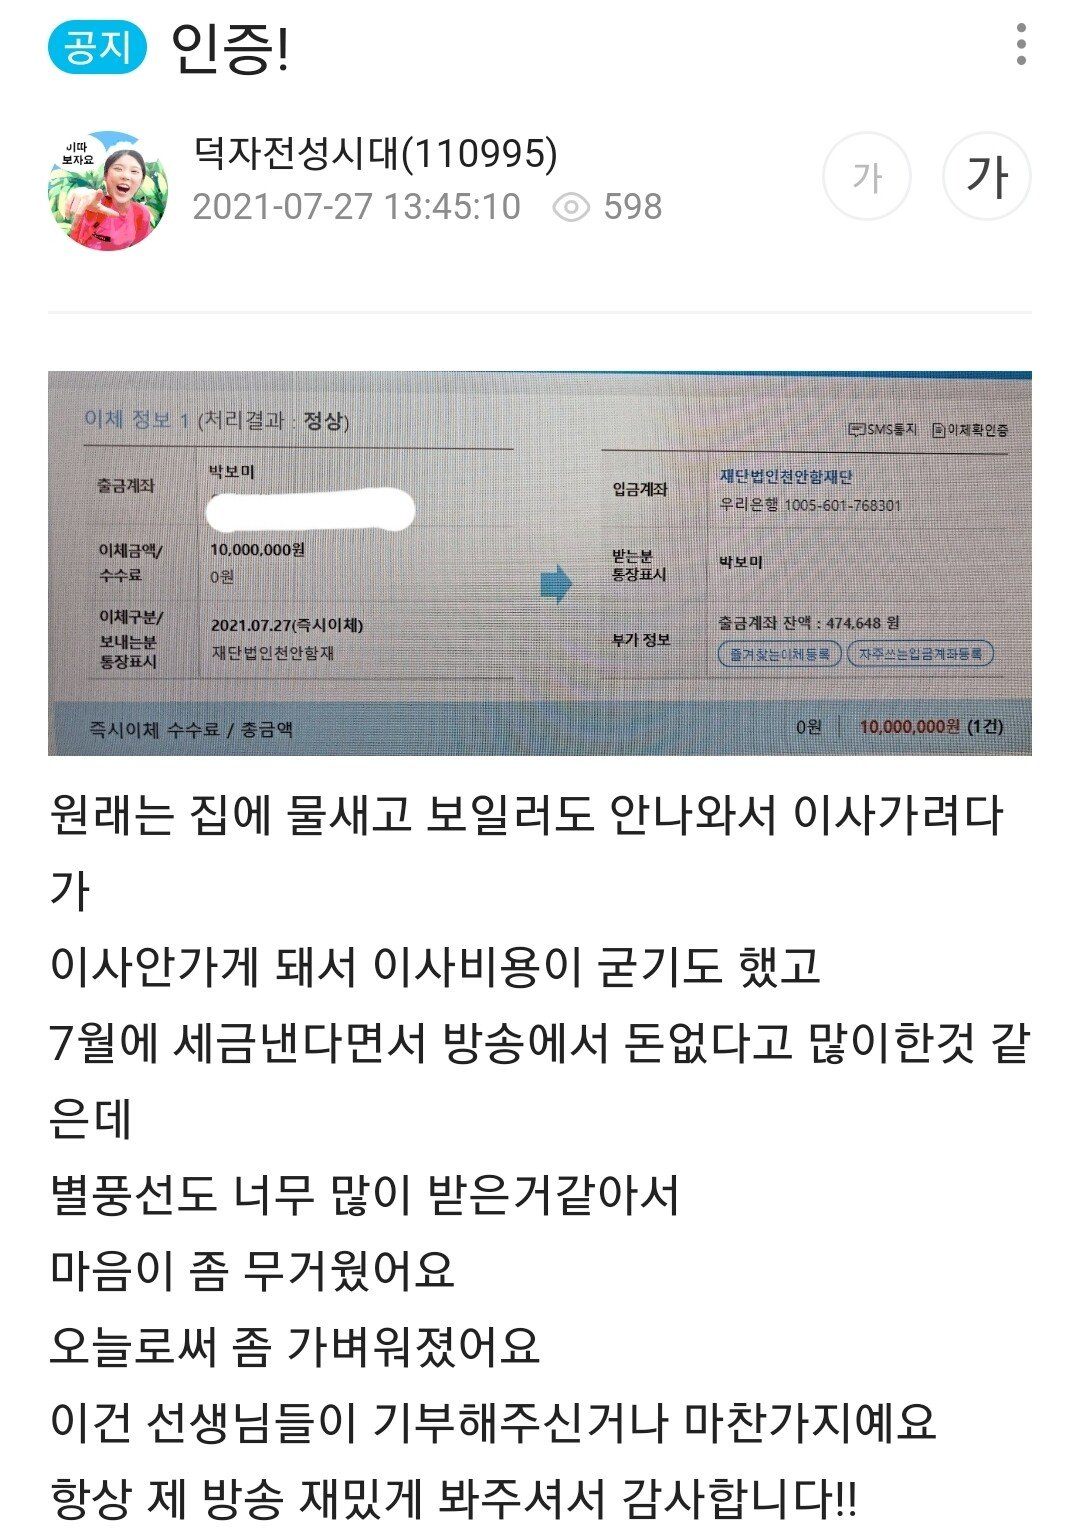 Screenshot_20210727-135723_AfreecaTV.jpg 천안함 재단에 1000만원 기부 인증한 BJ 덕자